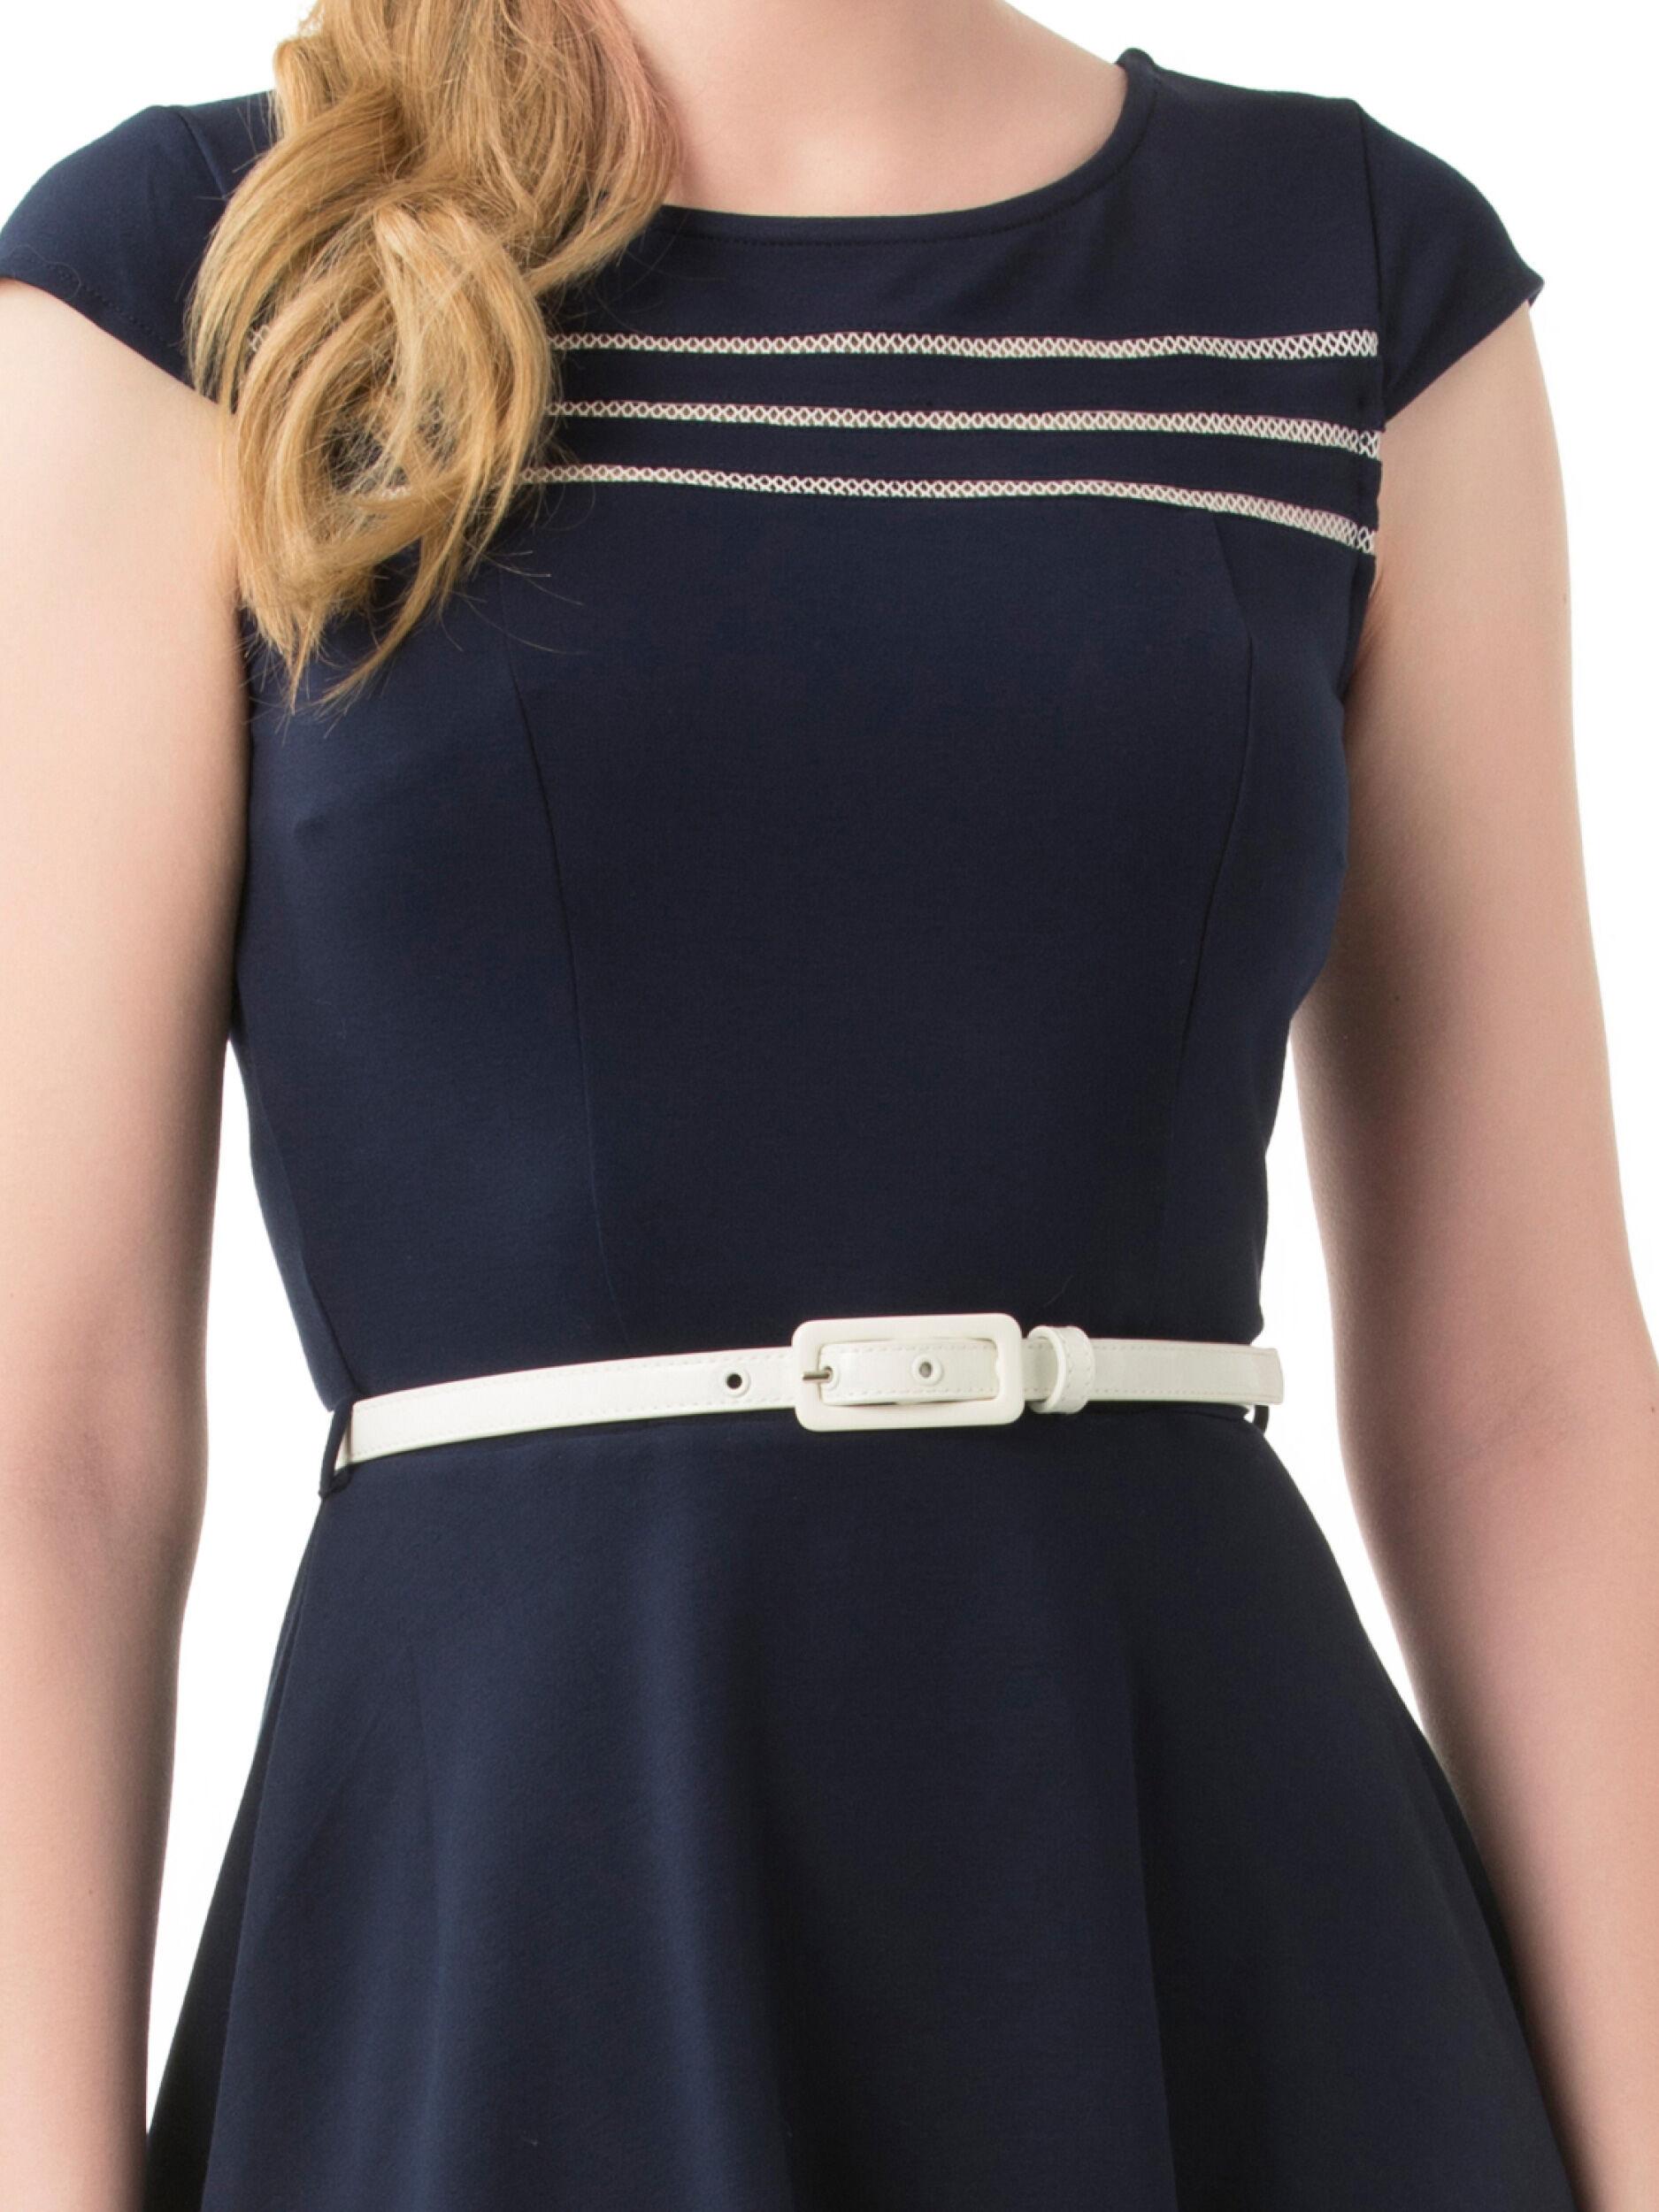 Louvre Dress